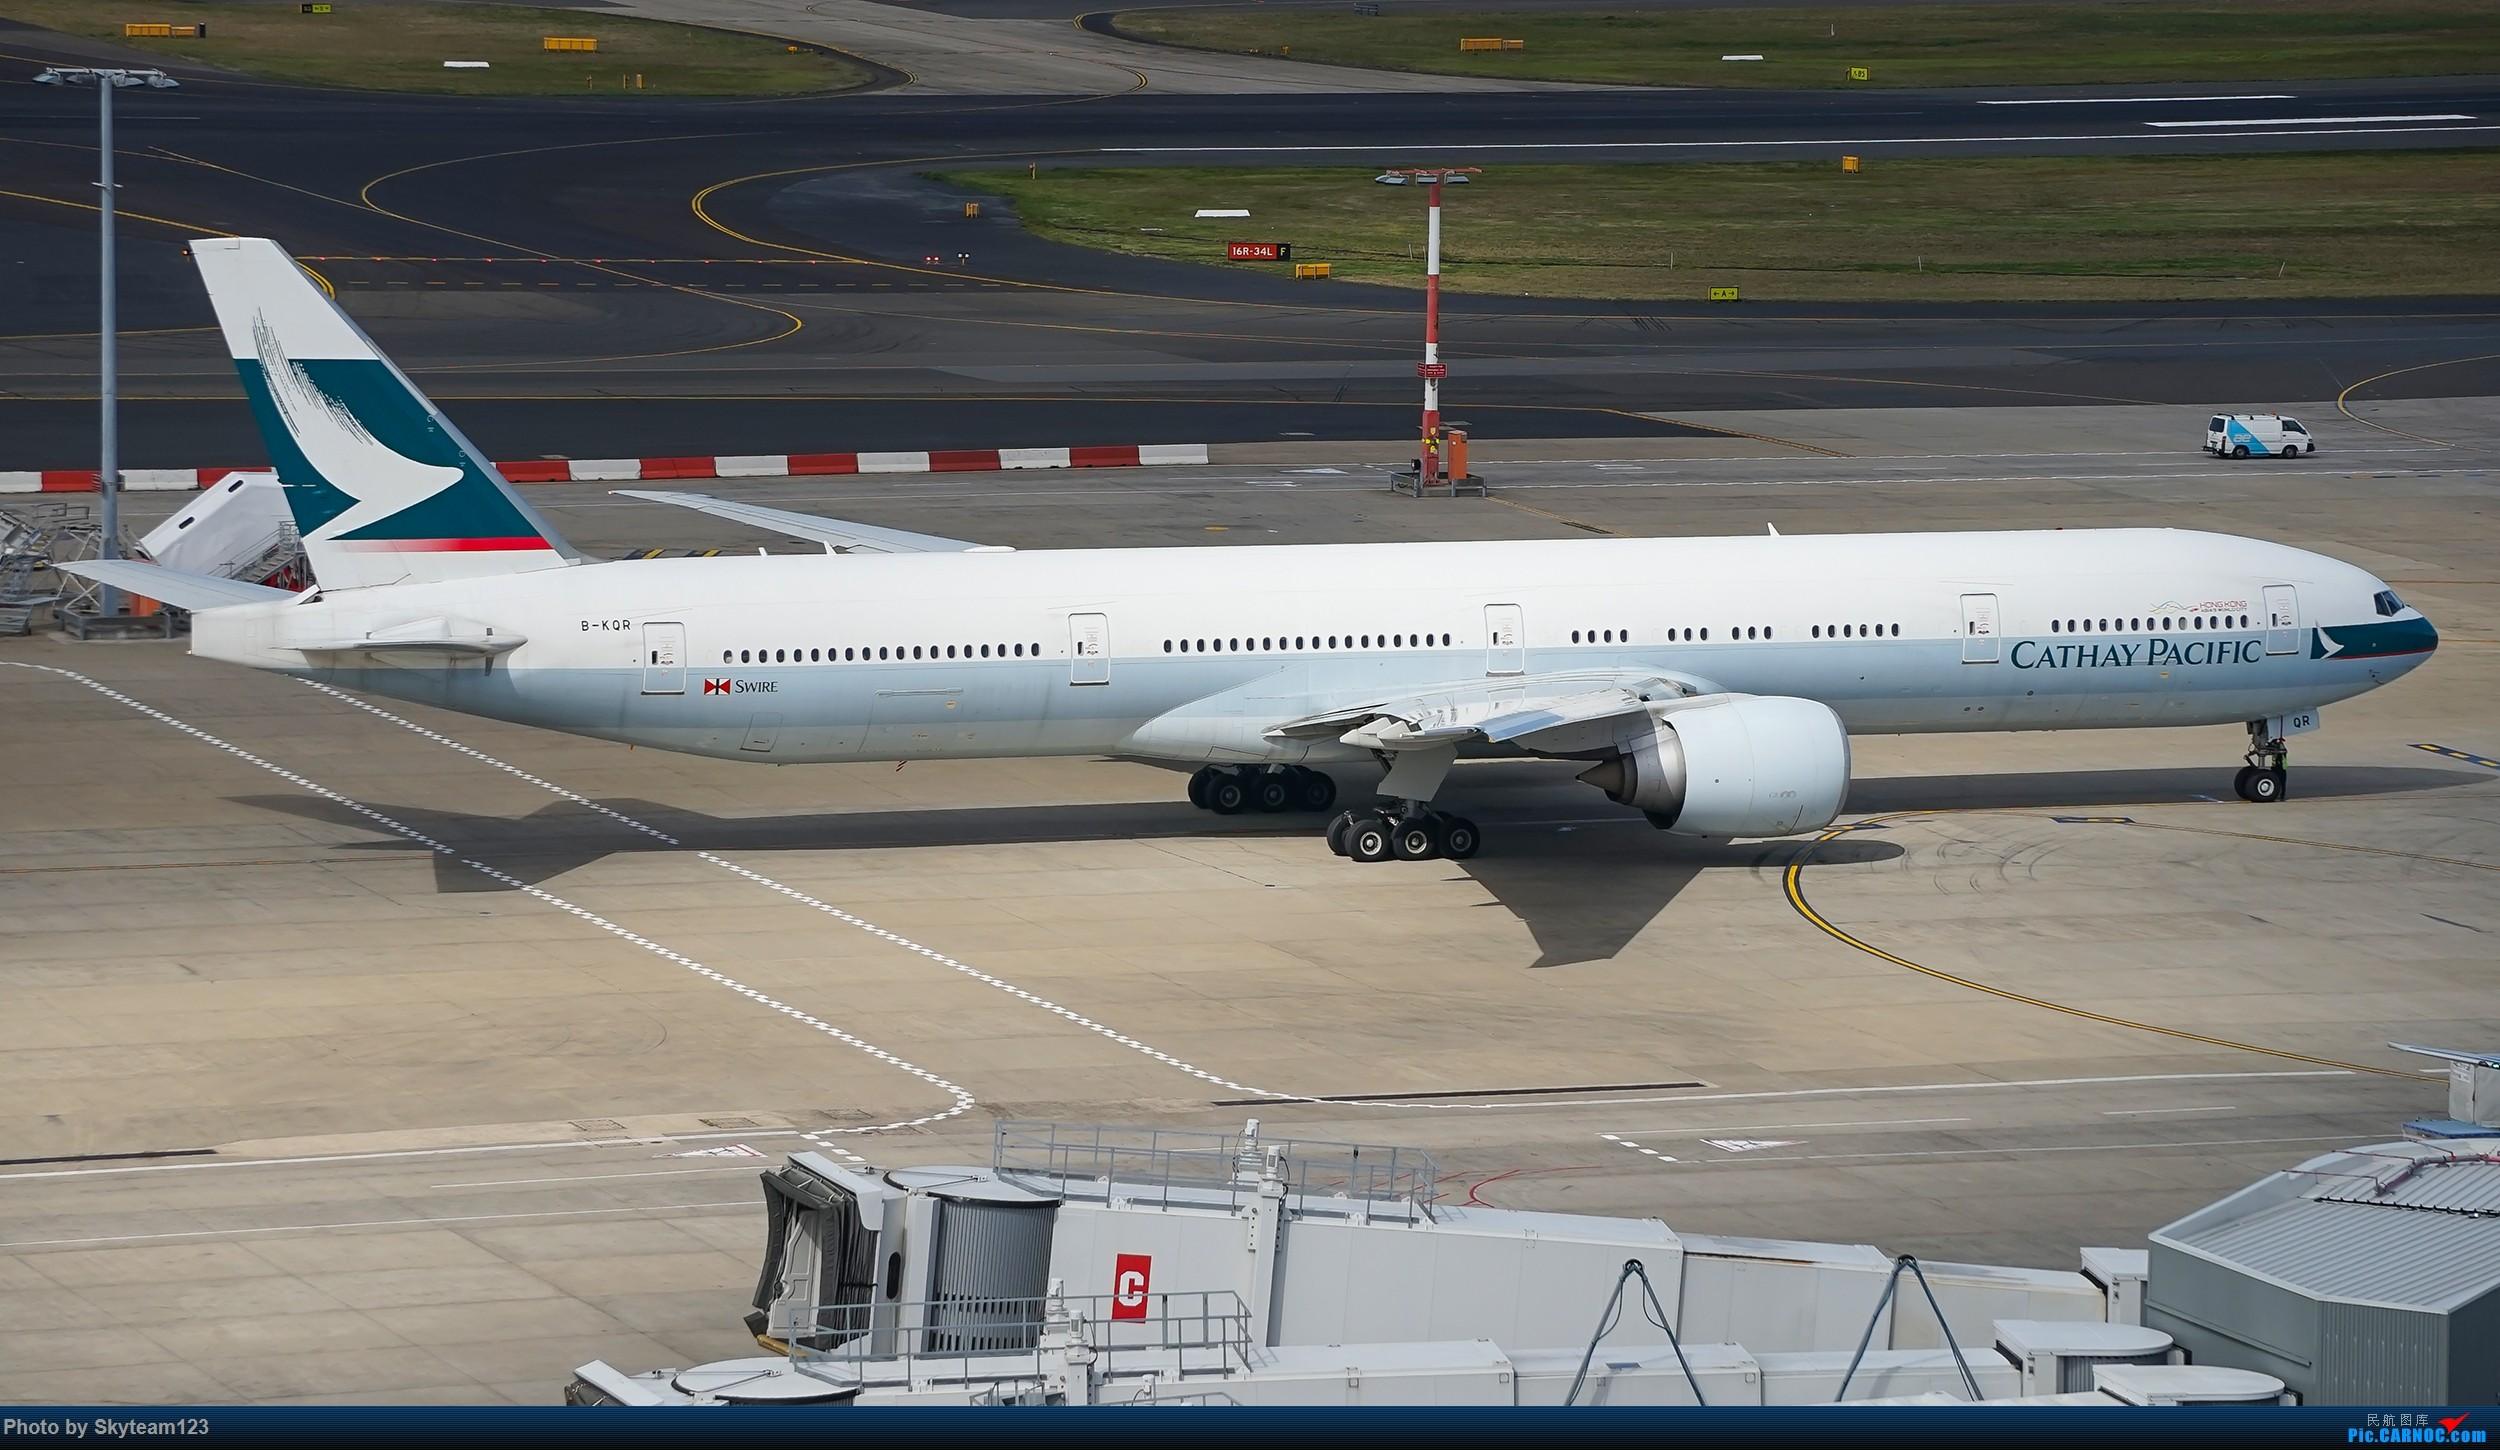 Re:[原创][SYD] 假期拍机小结 解锁16R跑道头拍机位 & 停车楼拍机作业 【全宽体】 BOEING 777-300ER B-KQR 澳大利亚悉尼金斯福德·史密斯机场